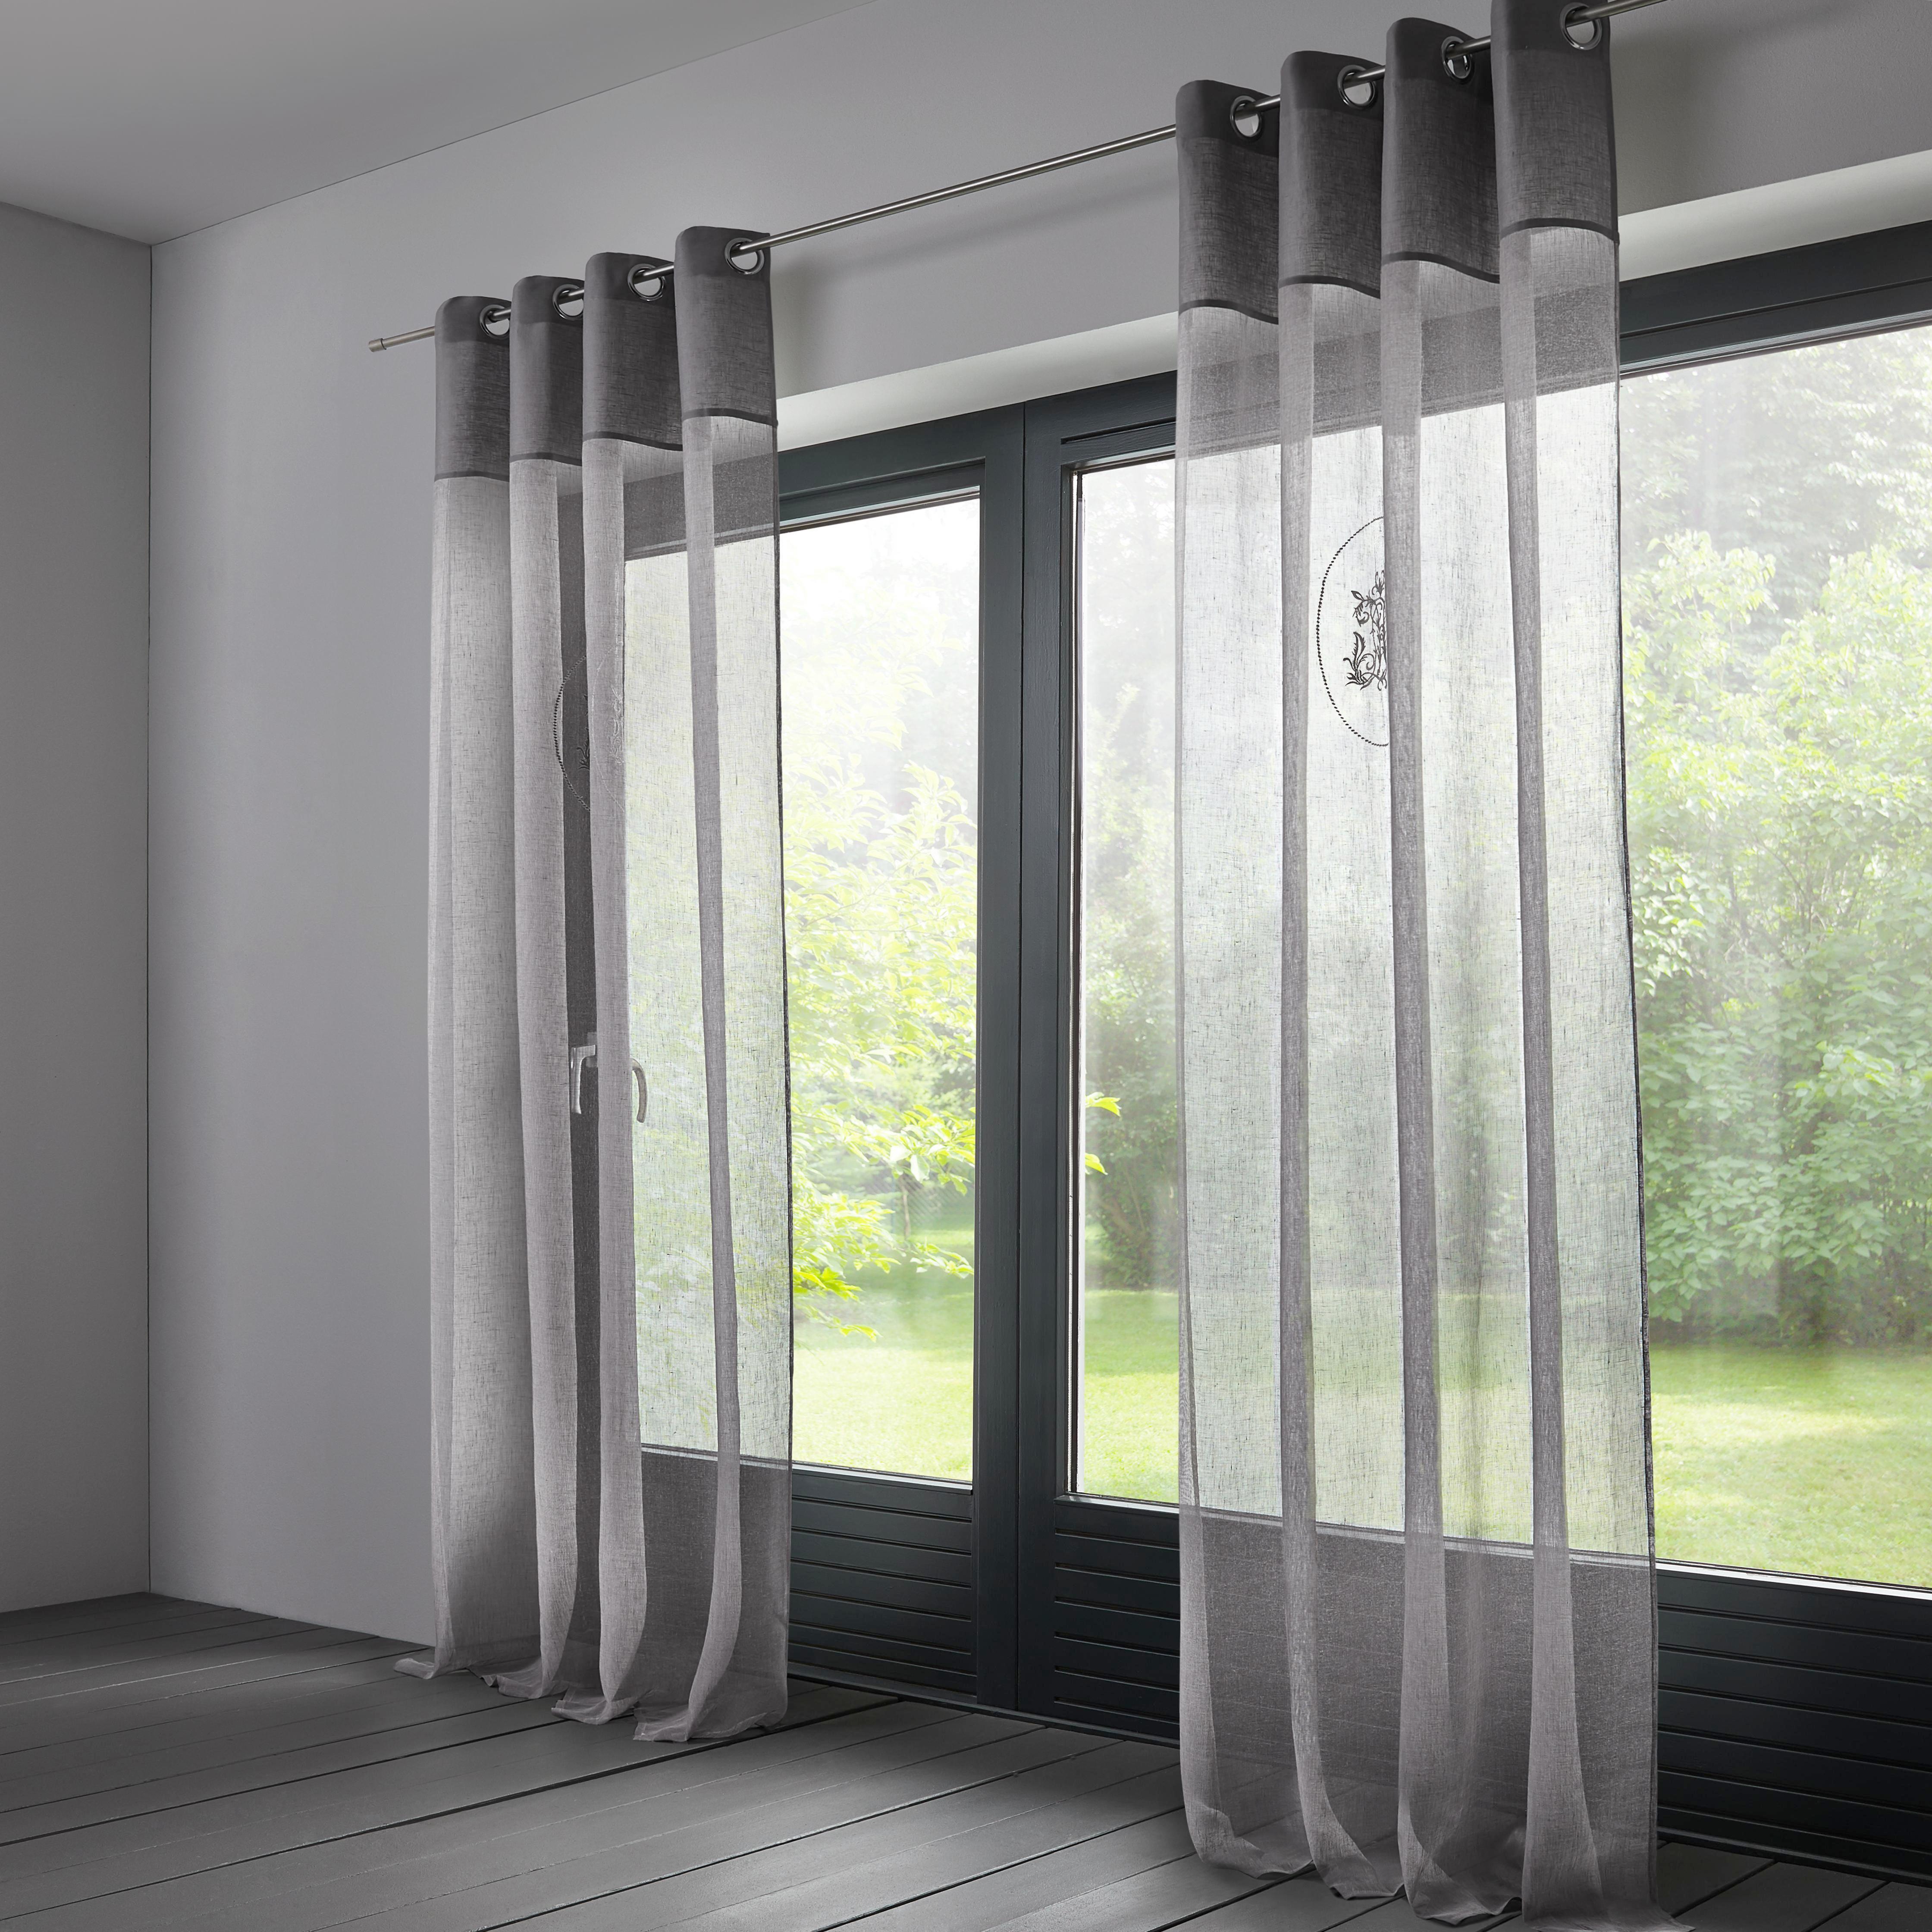 Leinenvorhang Emily 140x245cm - Hellgrau, KONVENTIONELL, Textil (140/245cm) - MÖMAX modern living